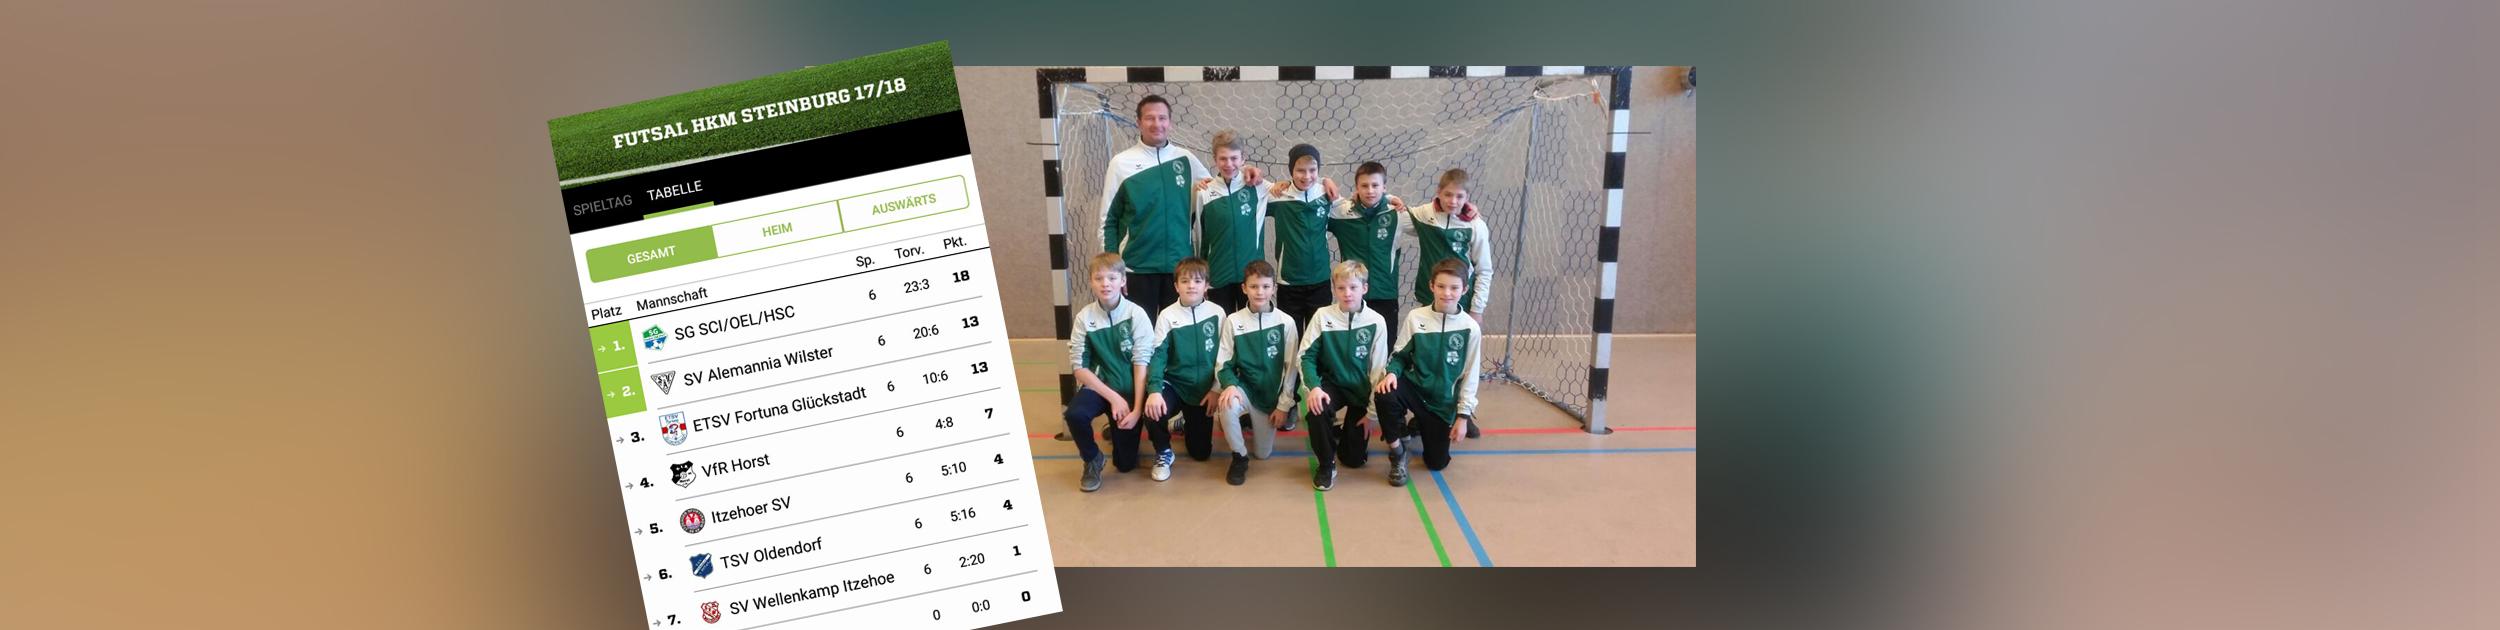 D-Junioren gewinnen Hallenkreismeisterschaften 2018